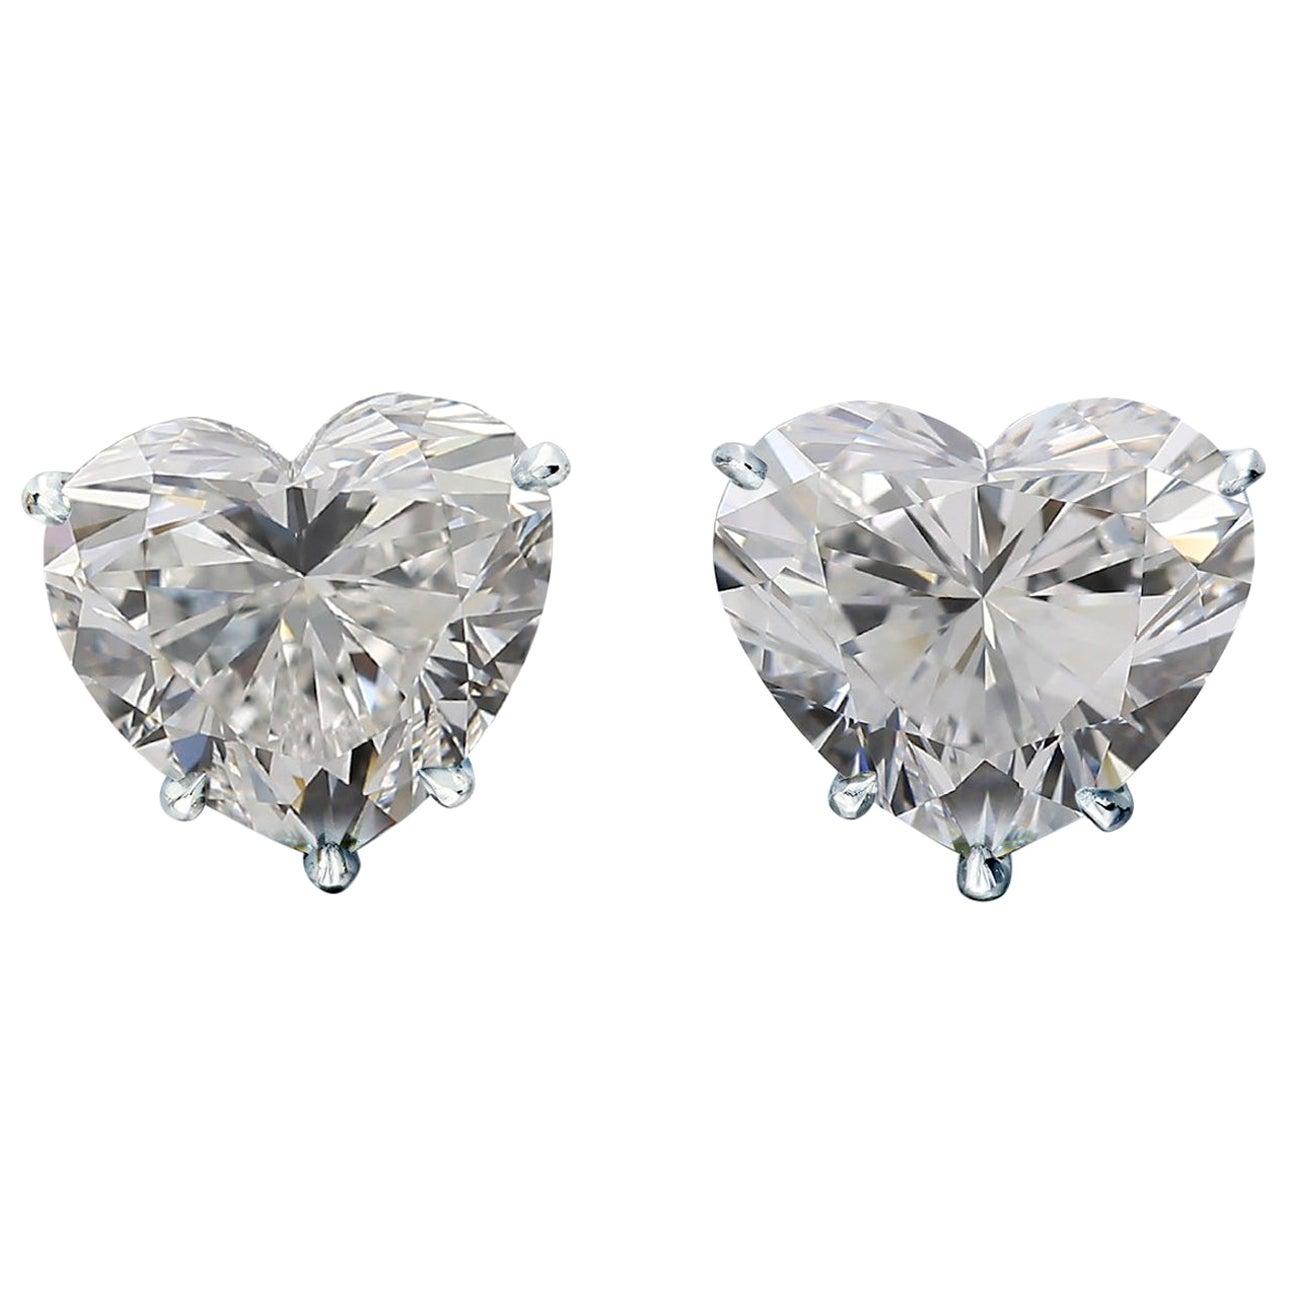 GIA Certified 1.01 Carat Heart Cut Diamond White Gold Studs Earrings D Color VVS